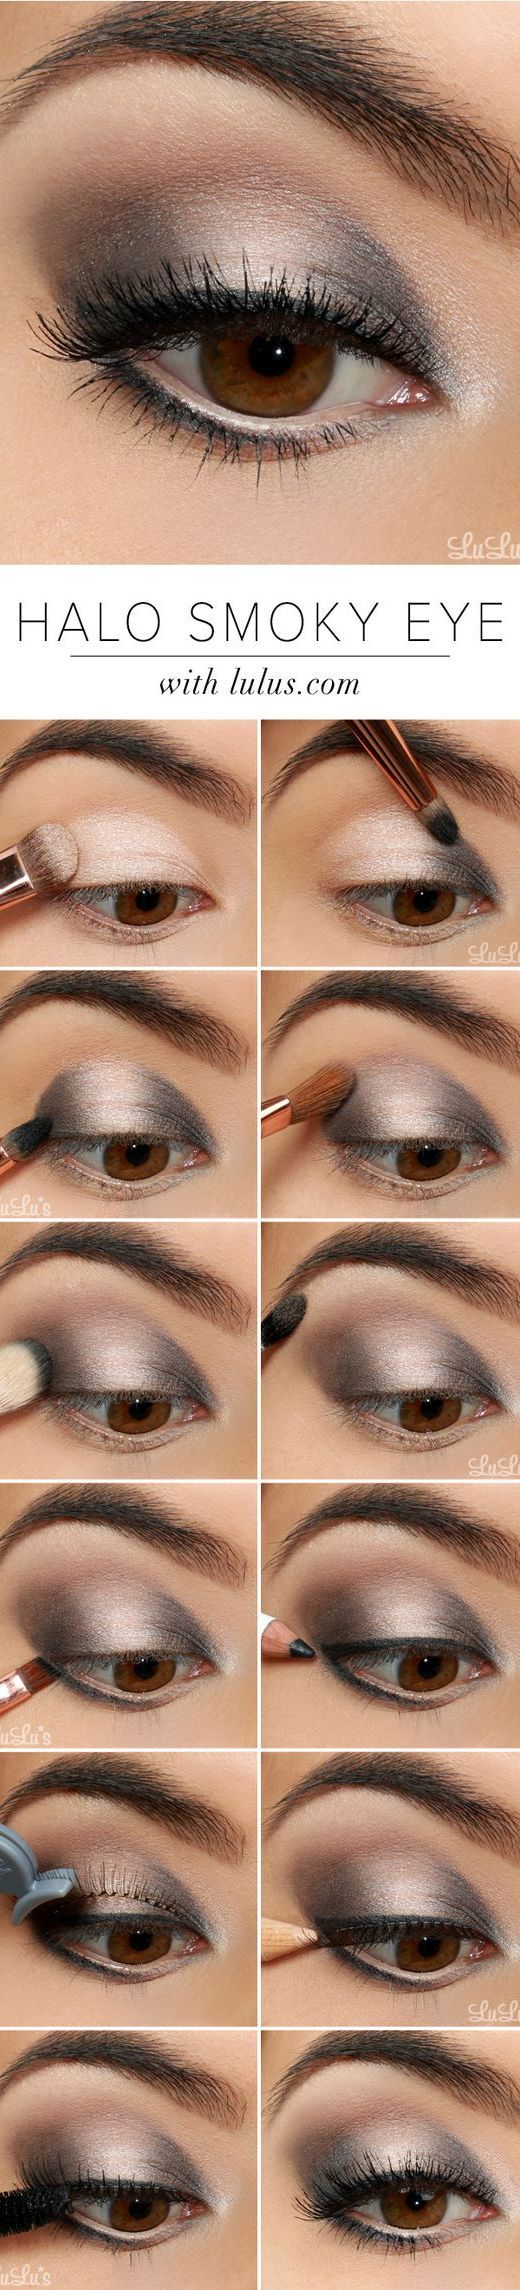 16 easy step by step eyeshadow tutorials for beginners belleza rh pinterest com